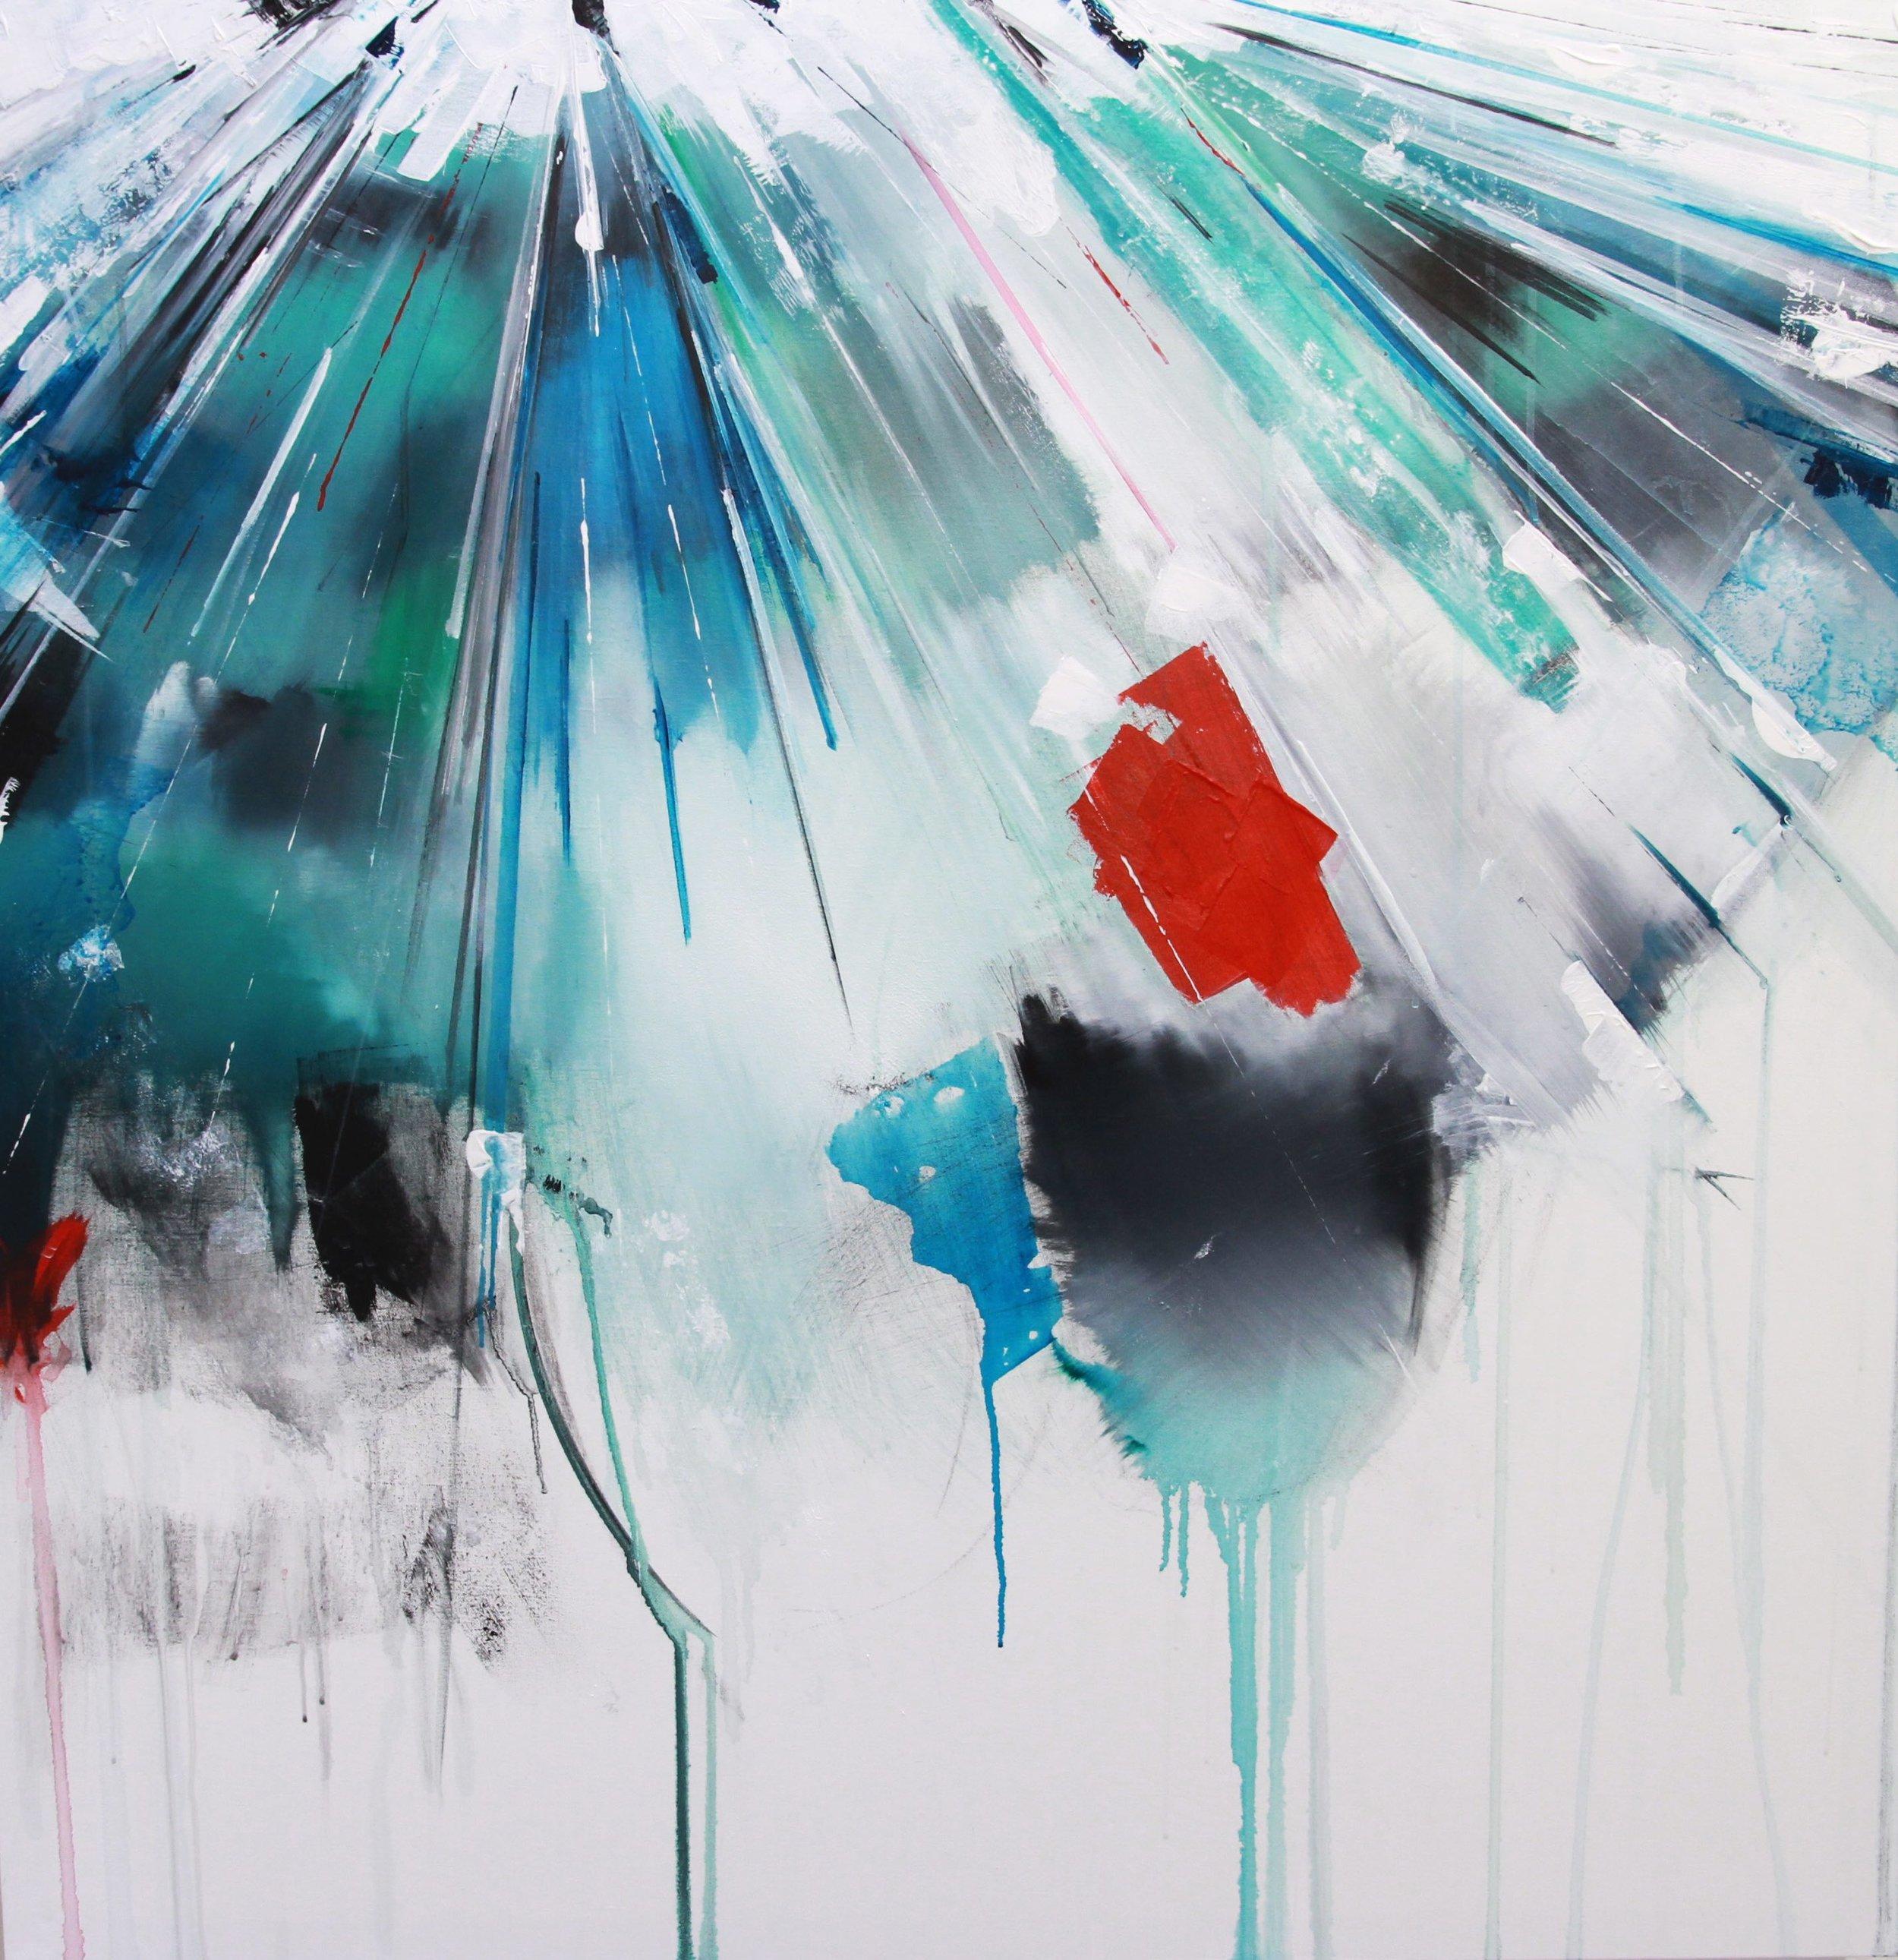 LauraBenetton_Swallowtail 100 x 100 cm acrylic on canvas.jpg